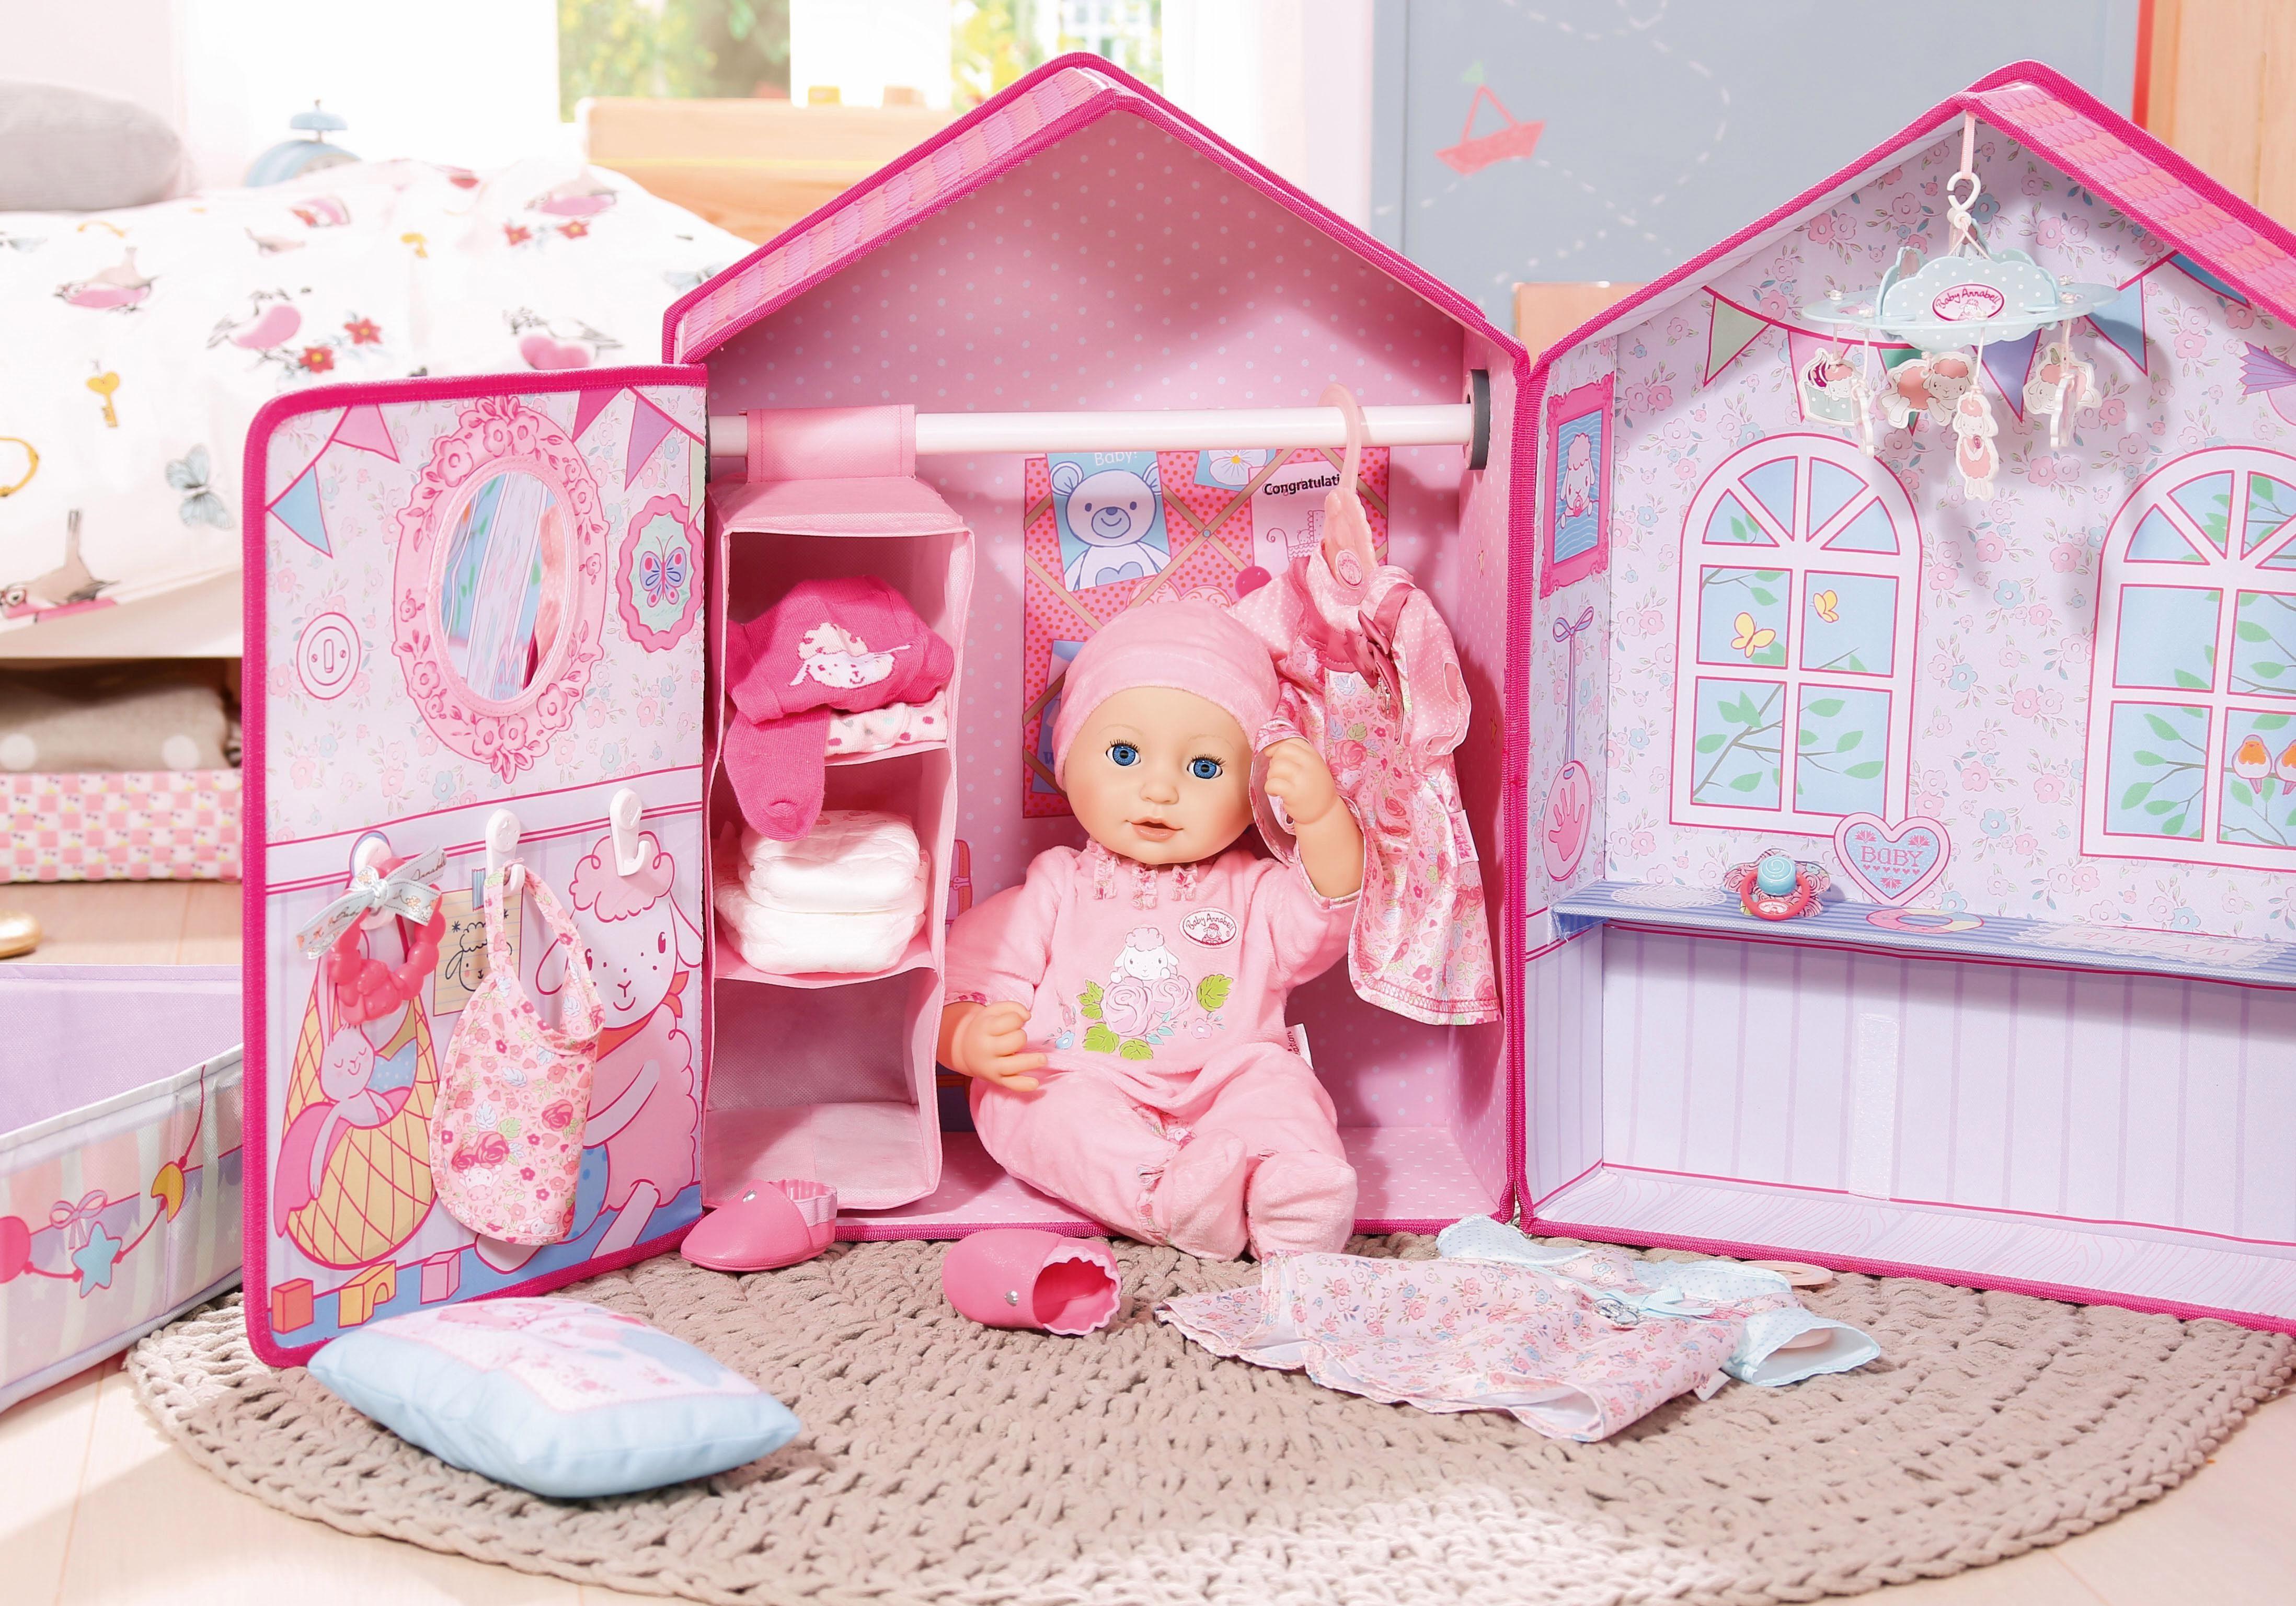 Playmobil Dollhouse Slaapkamer : Zapf creation poppenaccessoire baby annabell slaapkamer in de